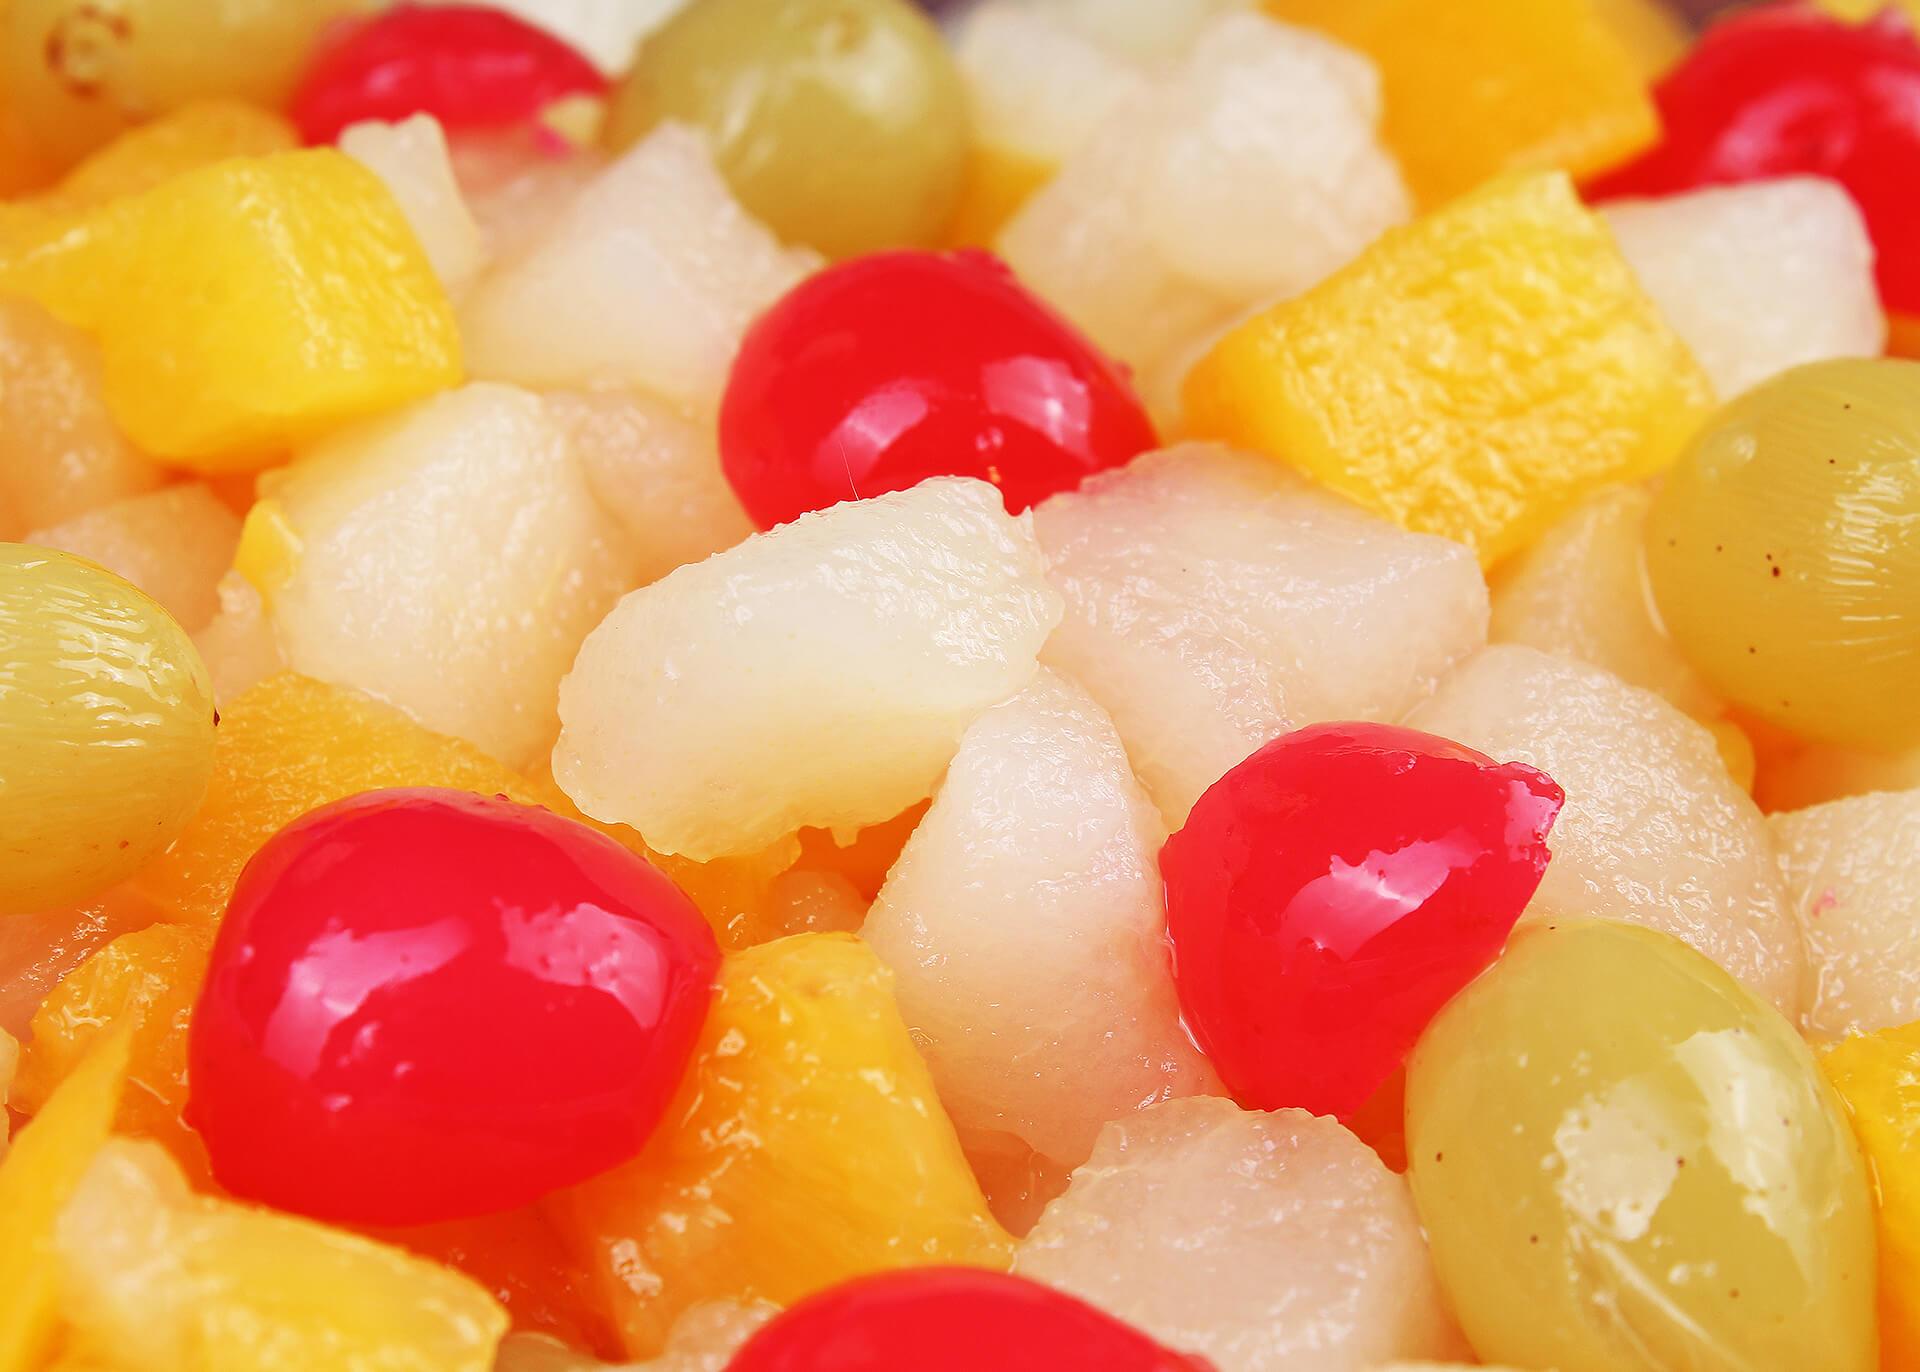 Fruchtcoctail Produktion